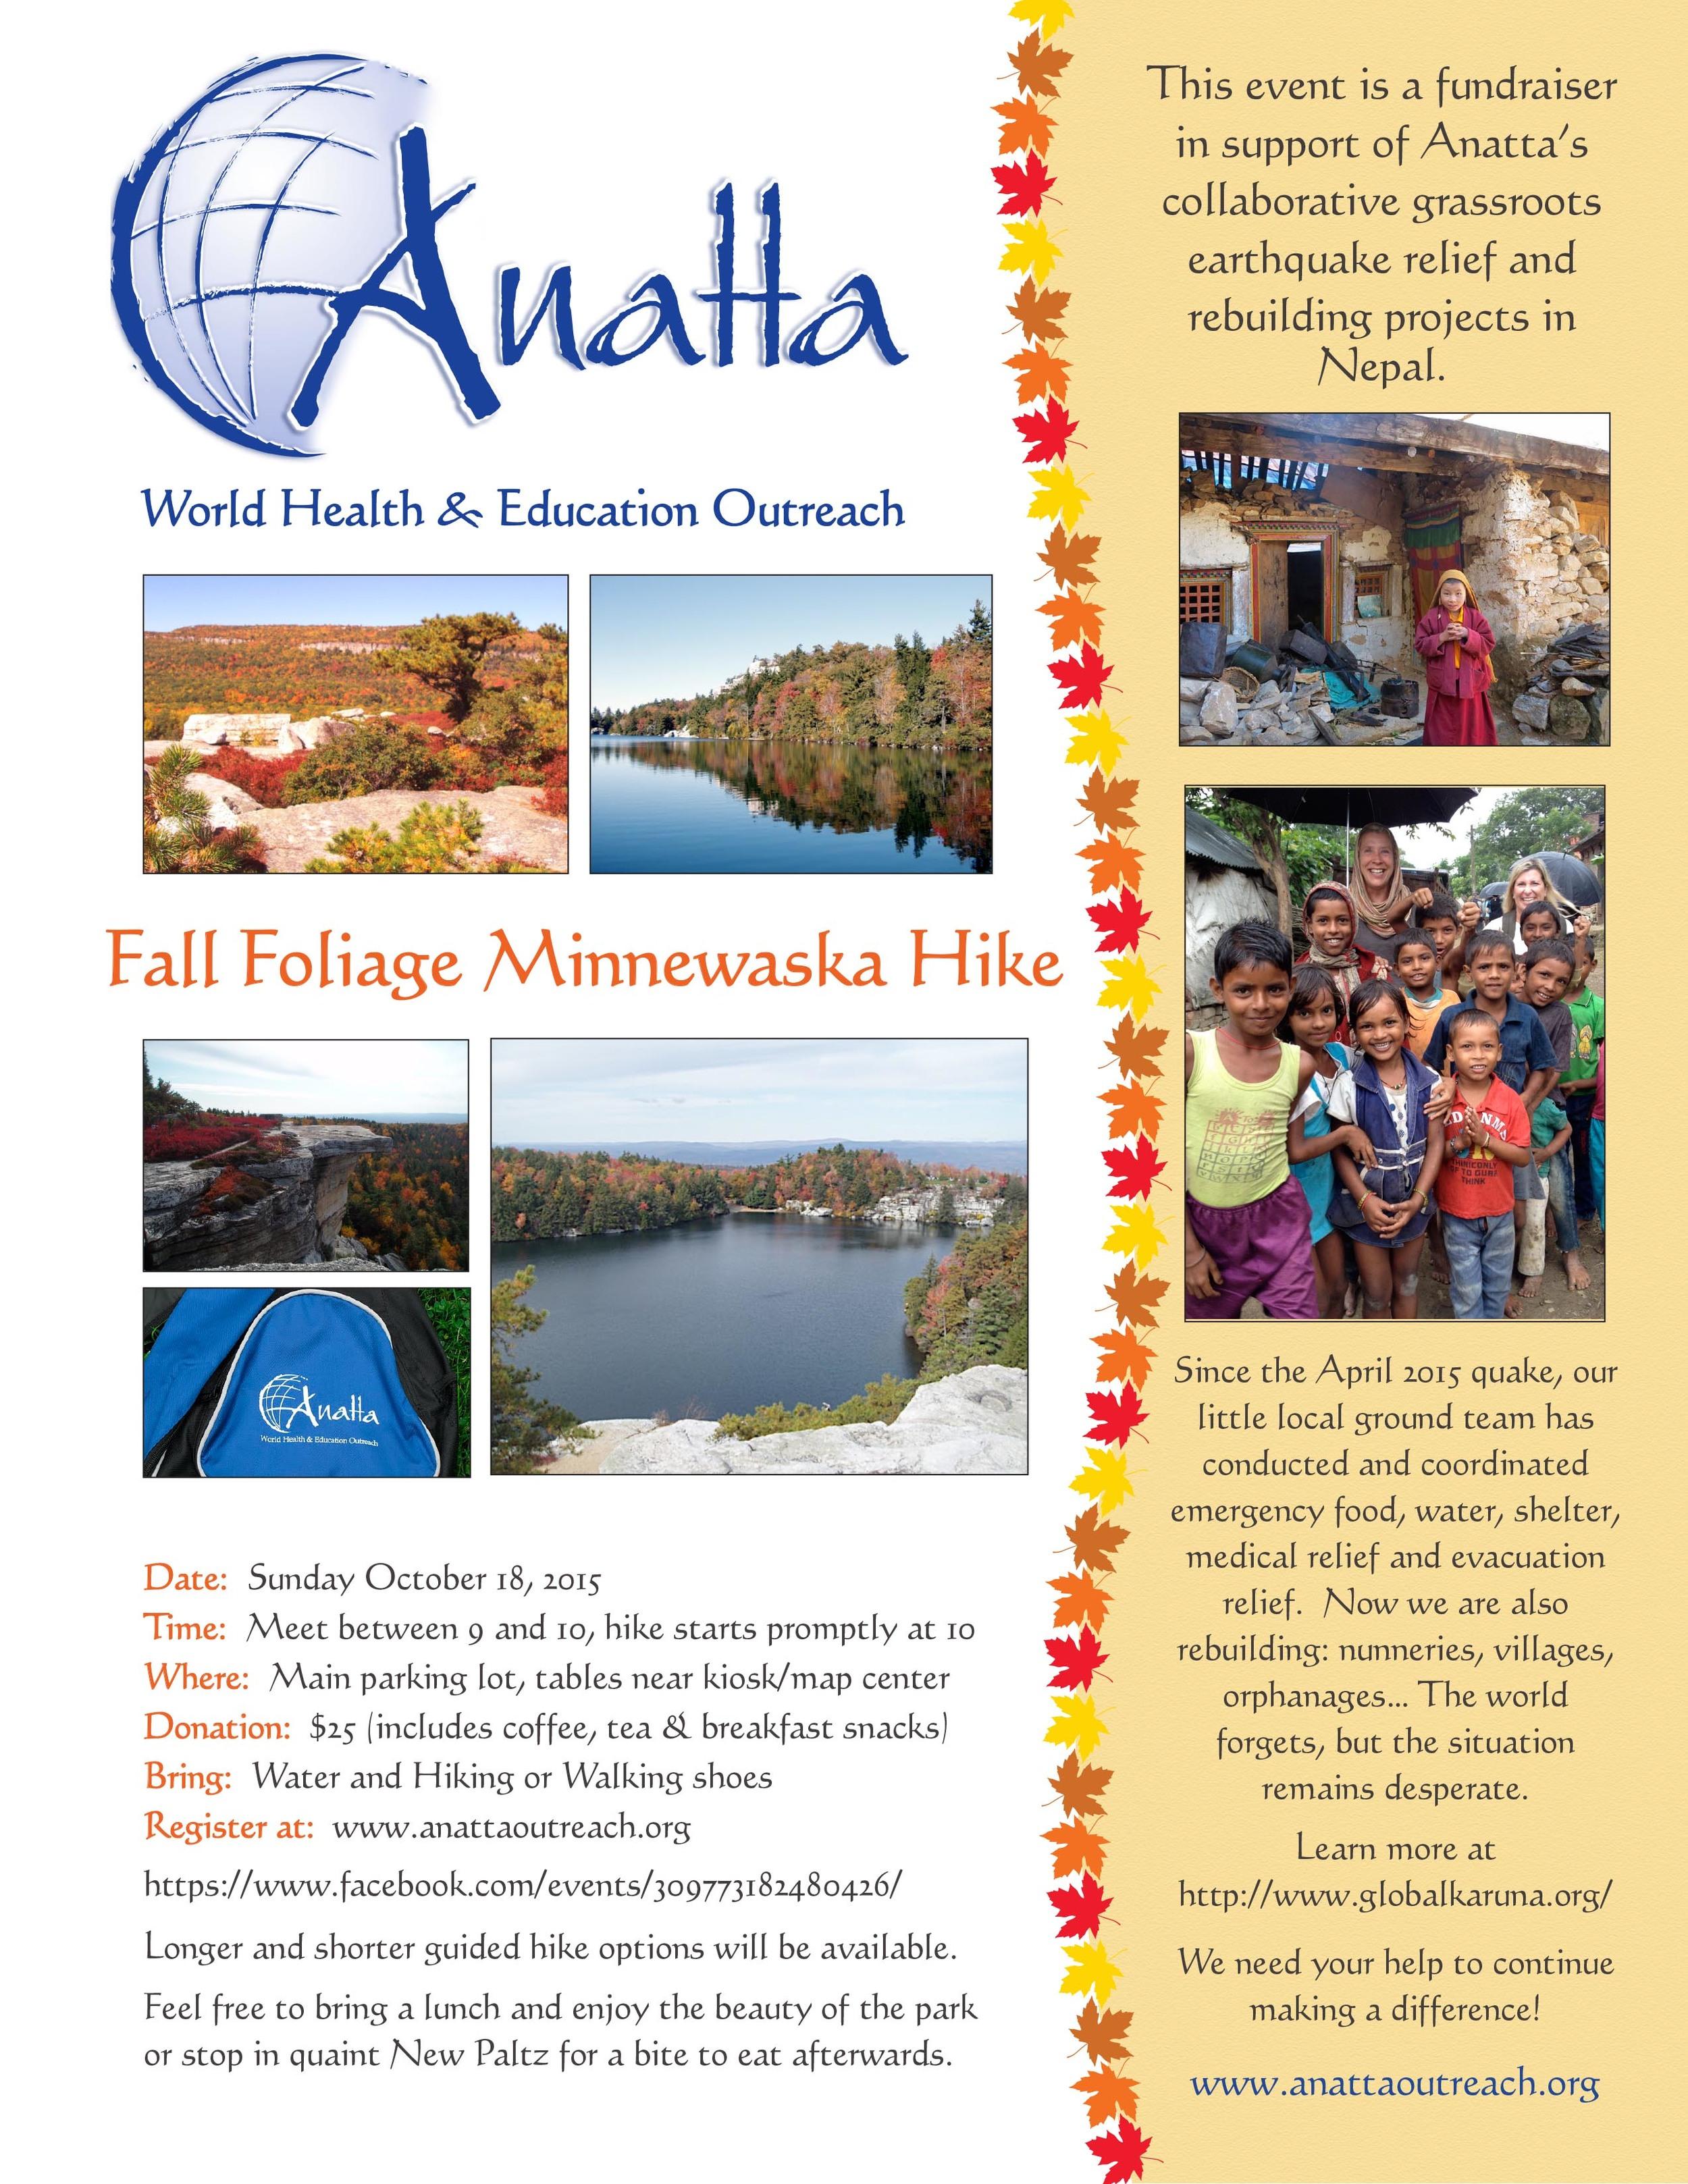 Anatta fall hike 2015.jpg